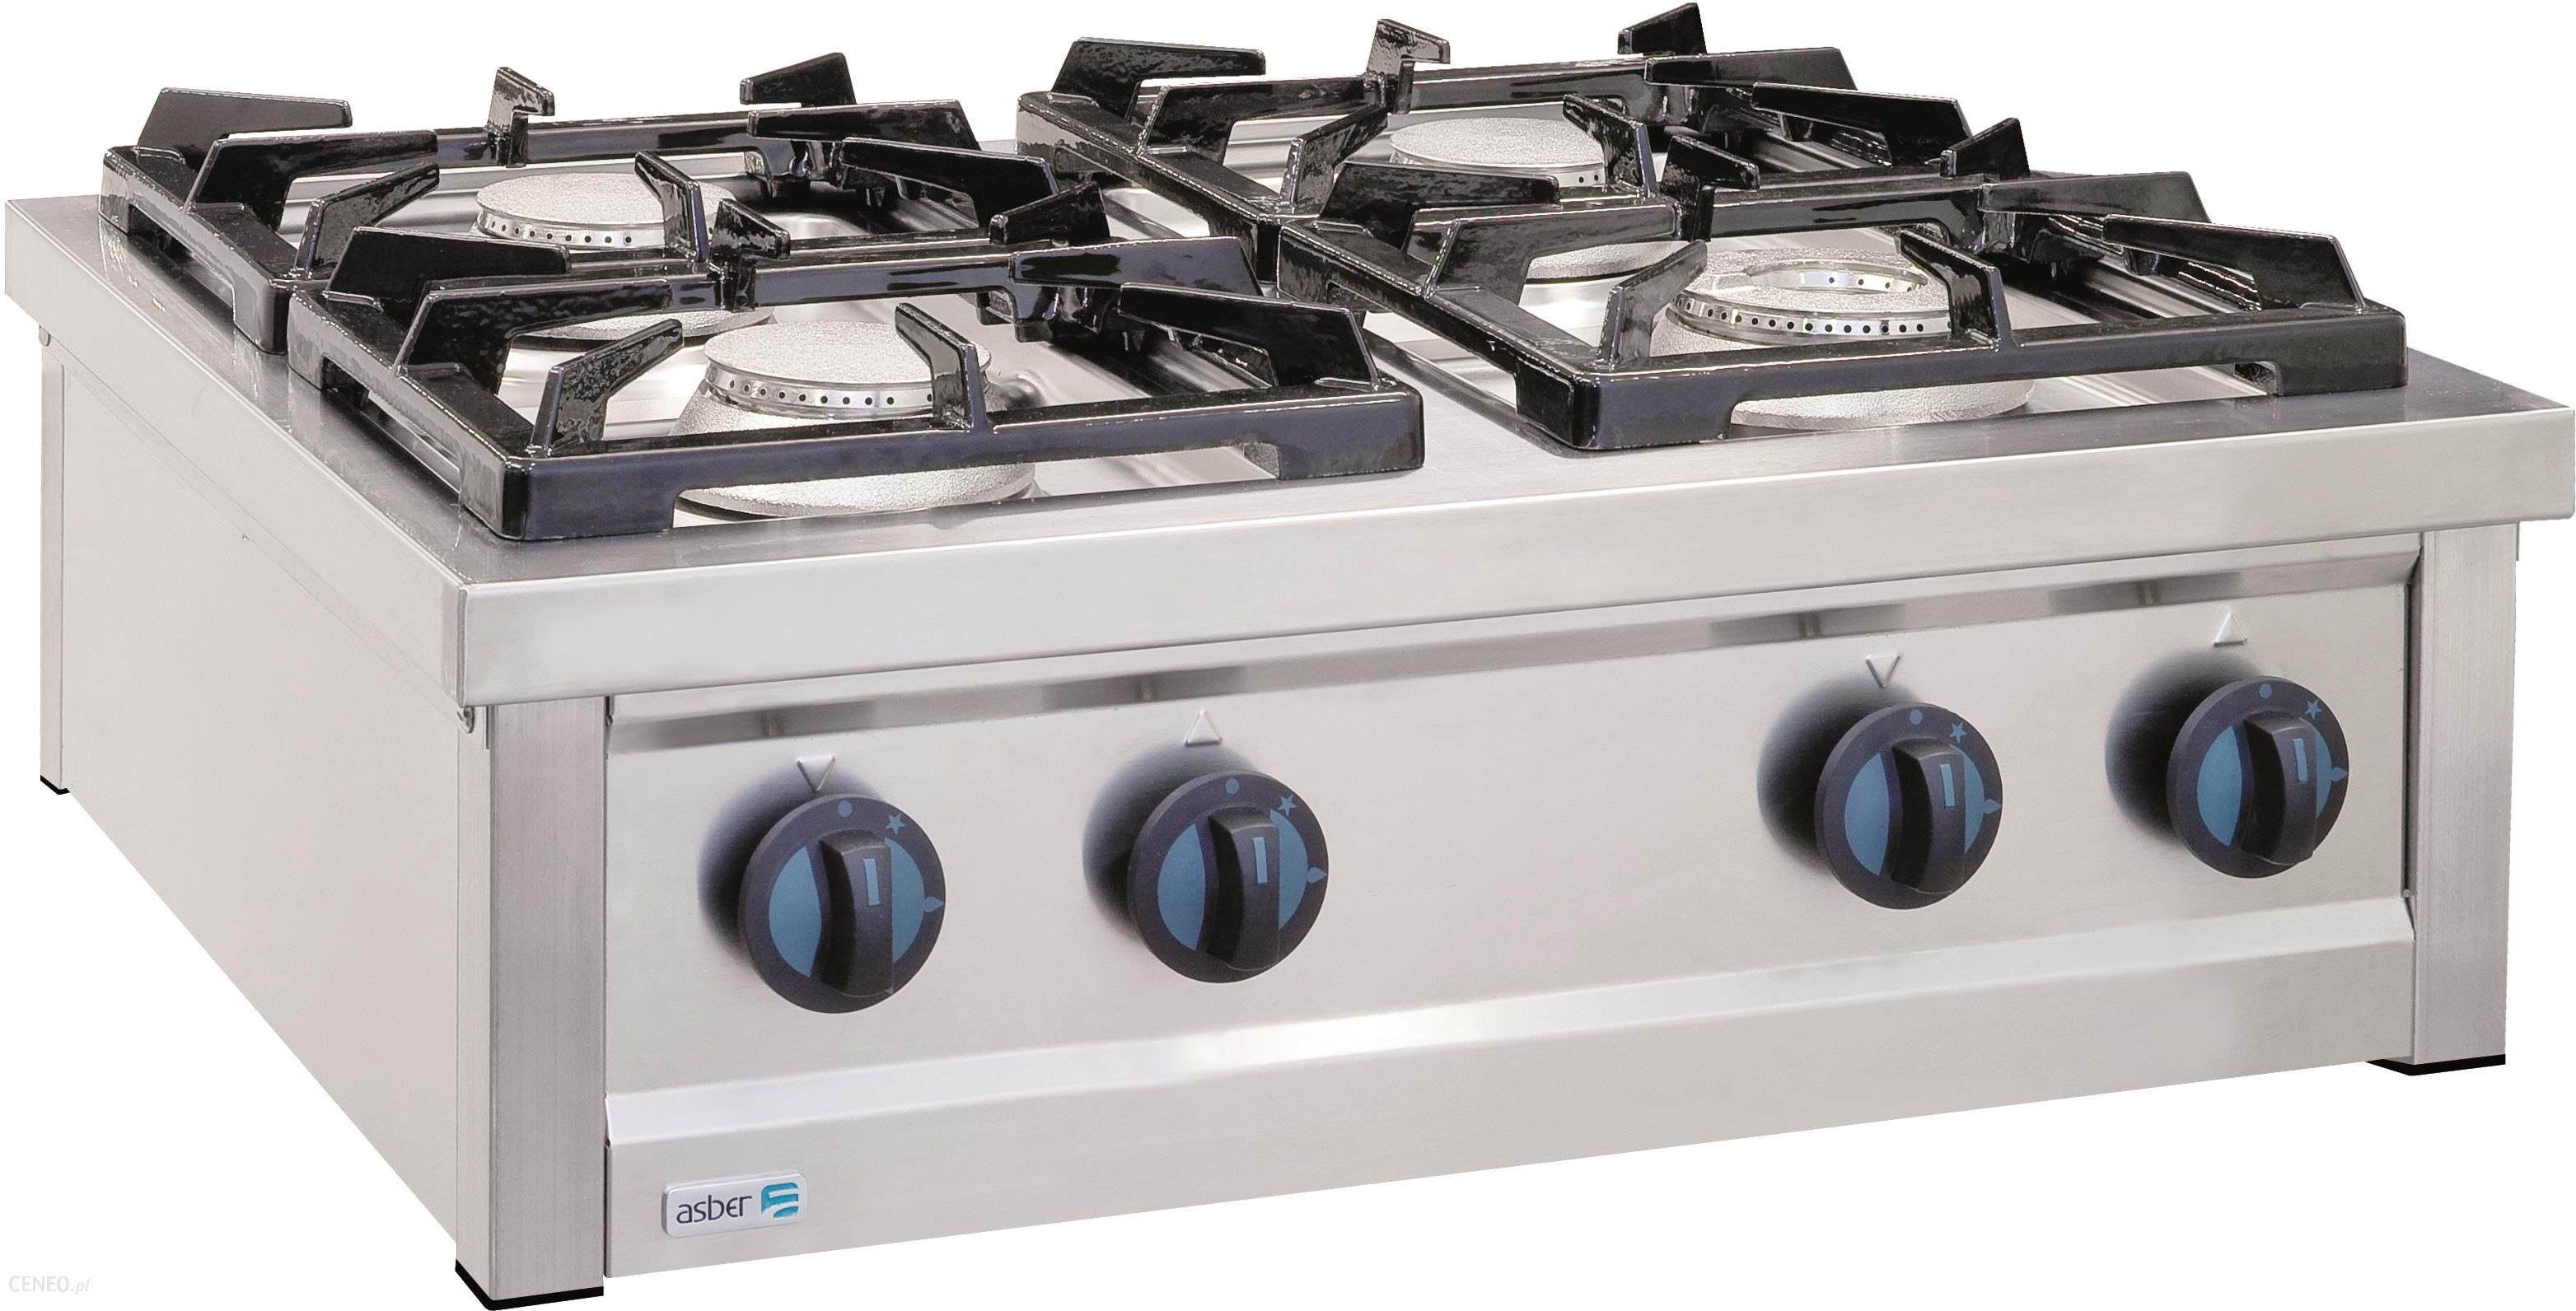 Kuchnia Gazowa 4 Palnikowa Nastawna Propan Butan 215 Kw 800x700x310 Mm Asber Eco Cook